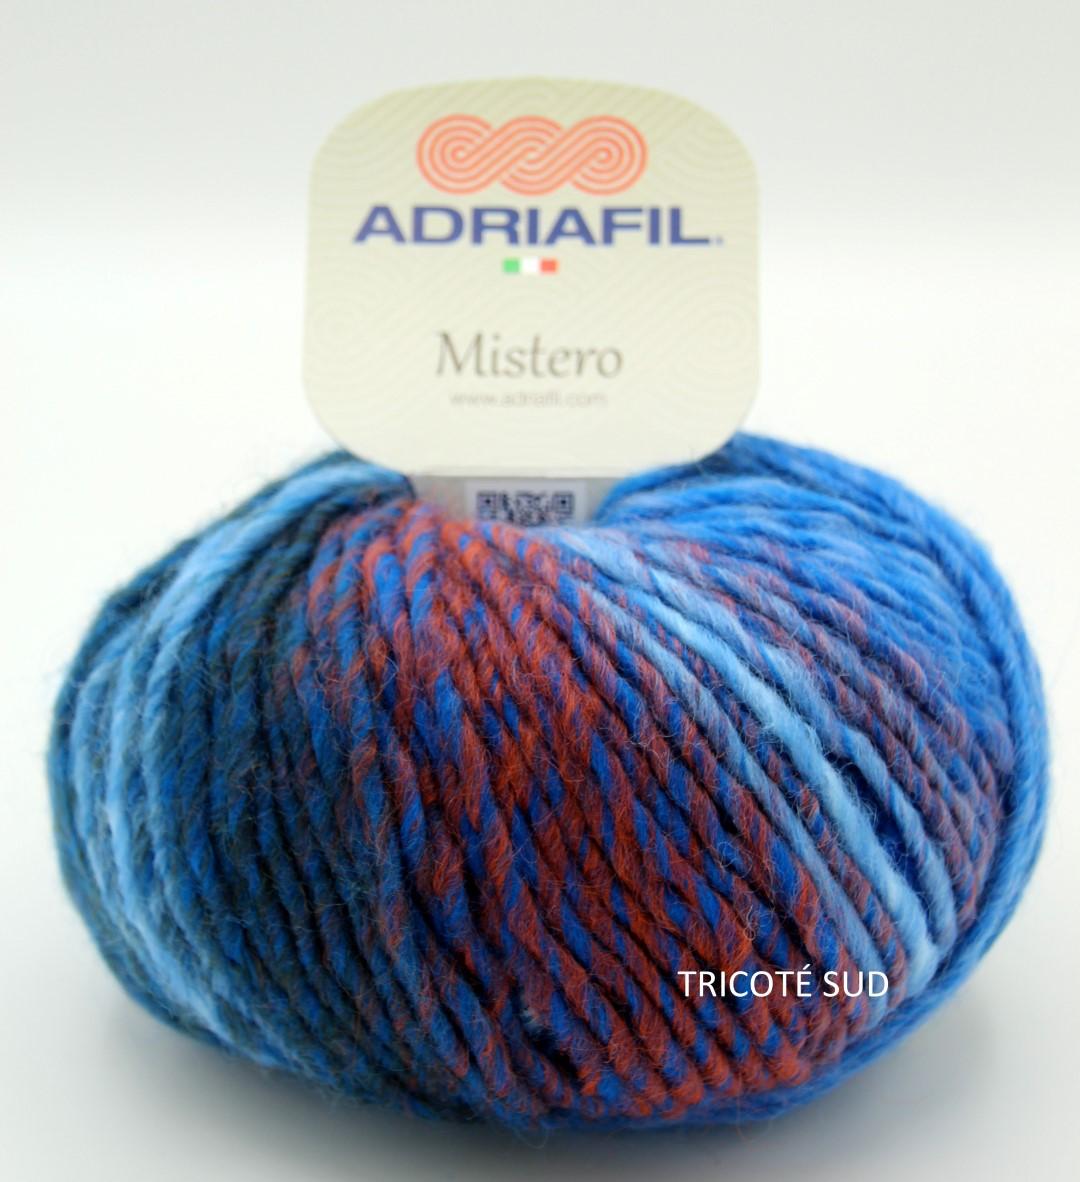 MISTERO ADRIAFIL COLORIS 50 (2) (Large)